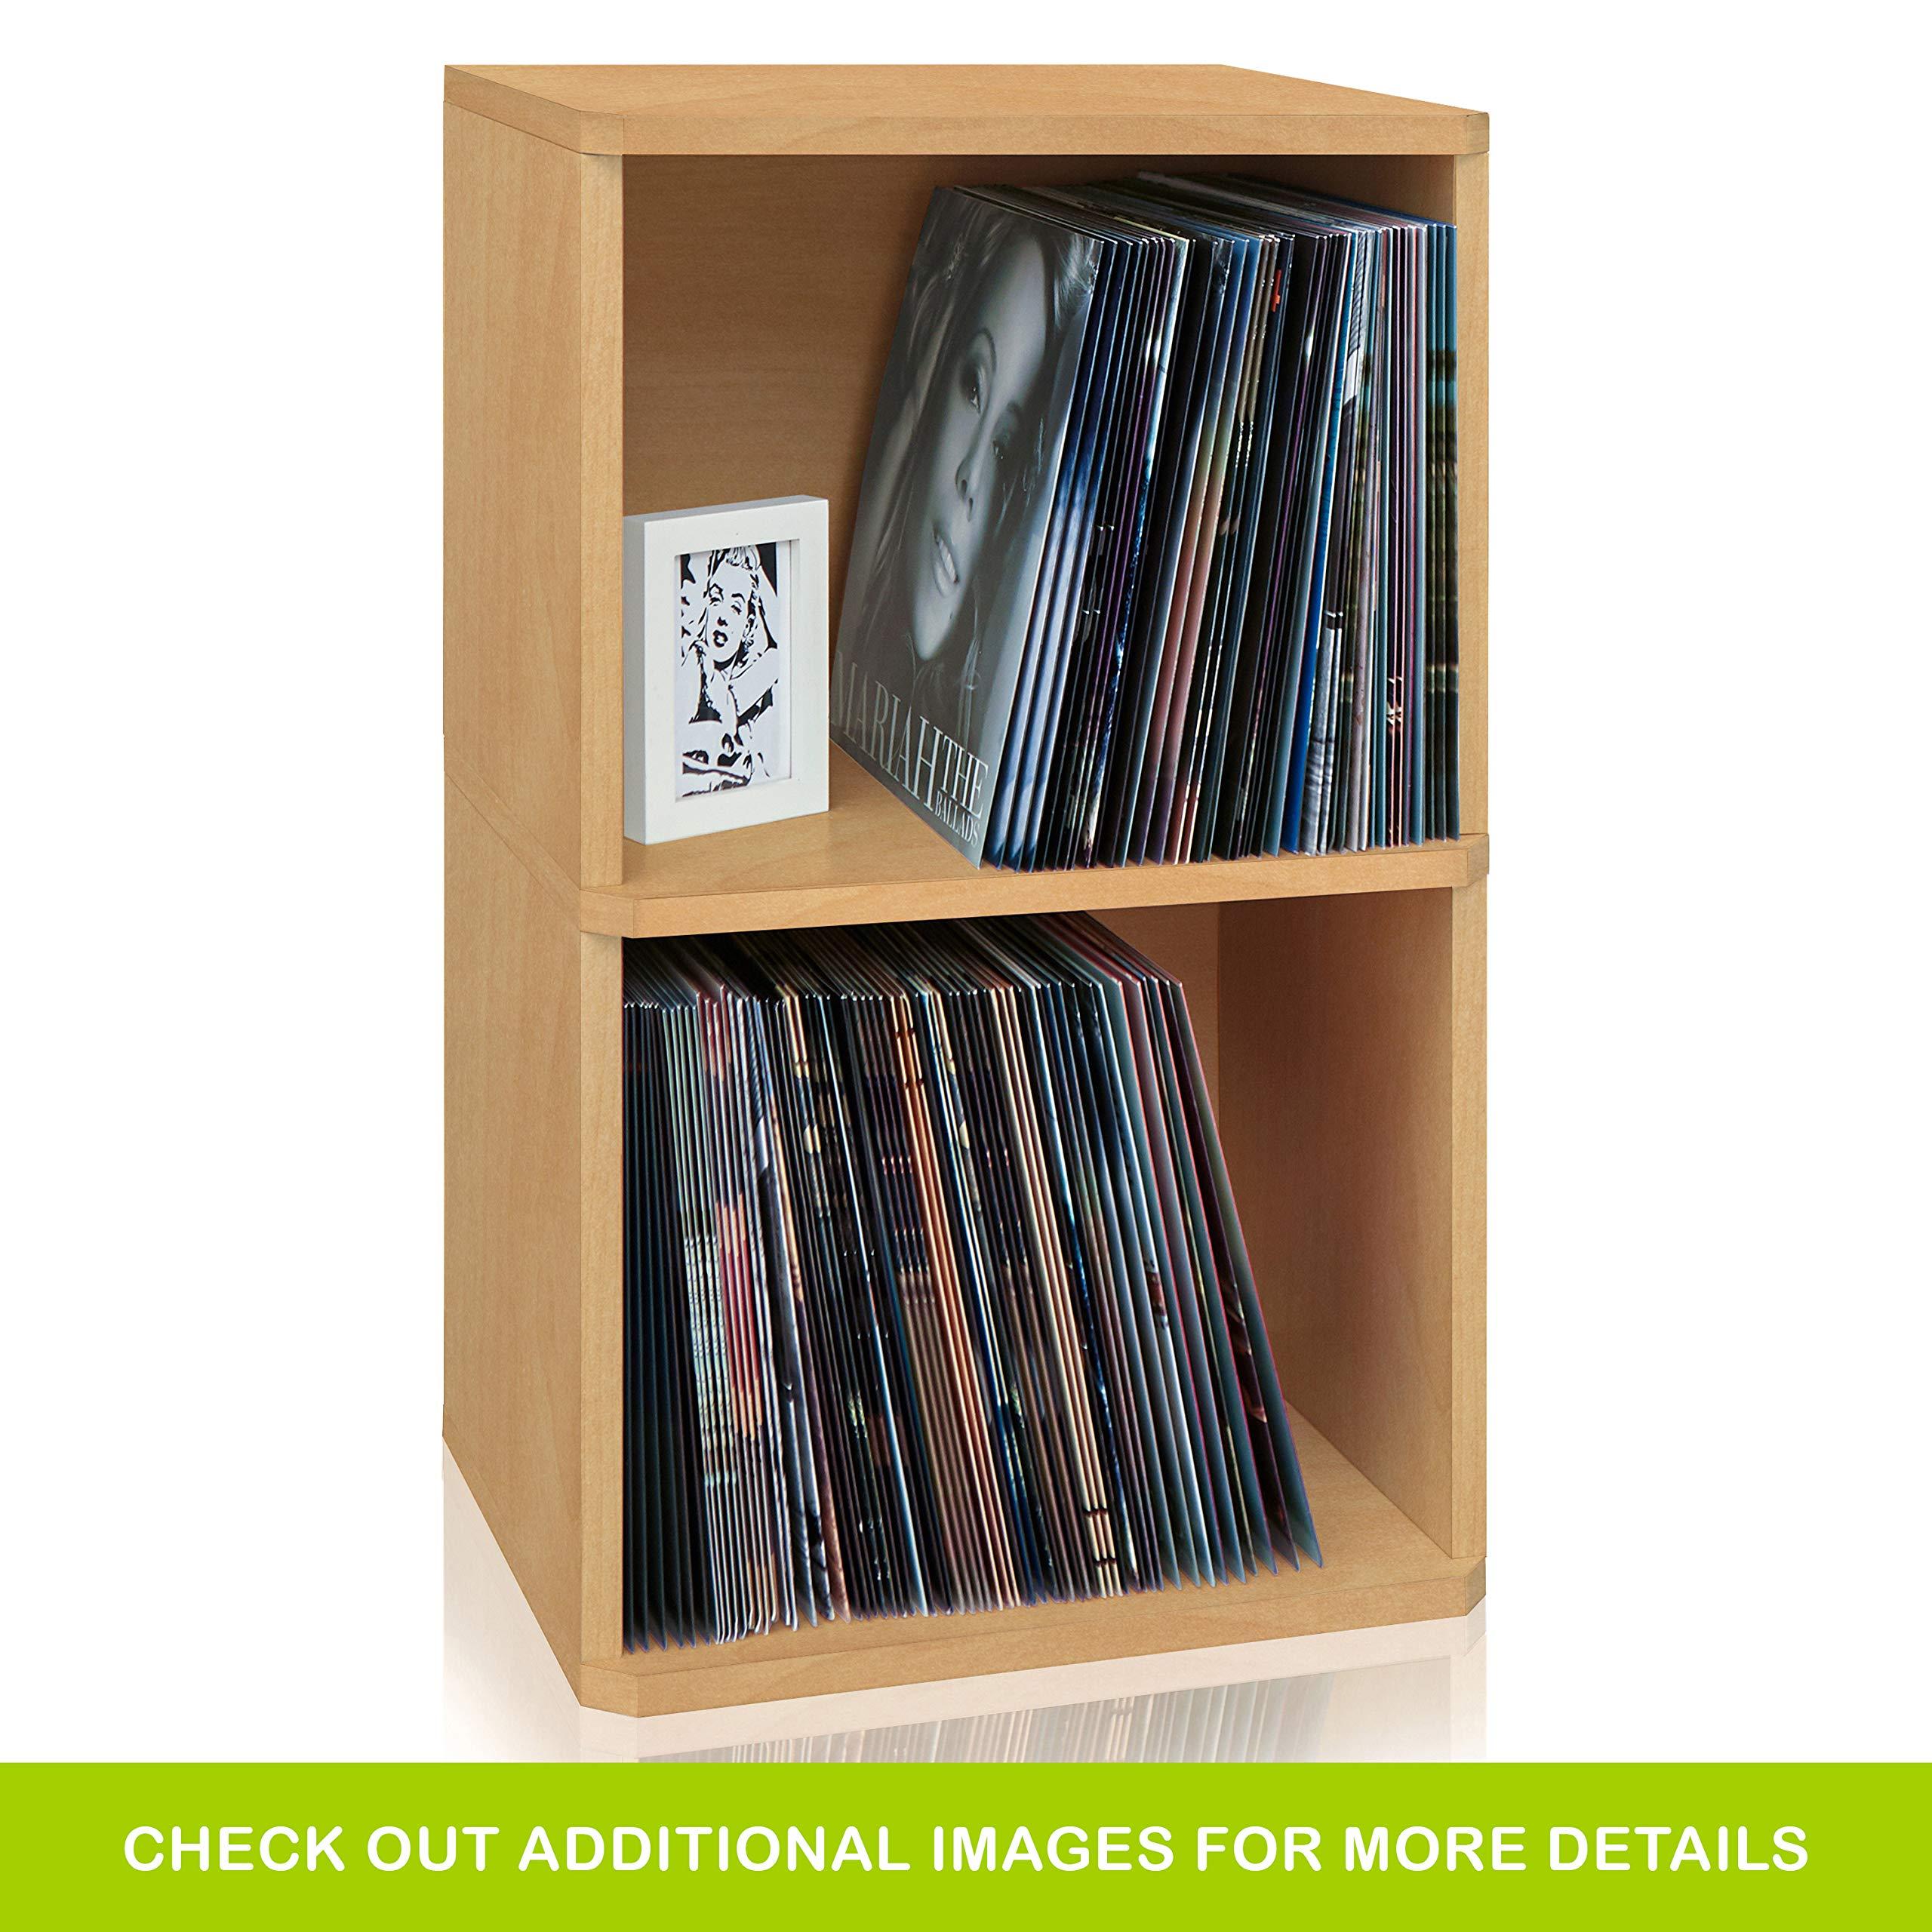 Way Basics 2-Shelf Vinyl Record Storage Cube and LP Record Album Storage Shelf, Natural by Way Basics